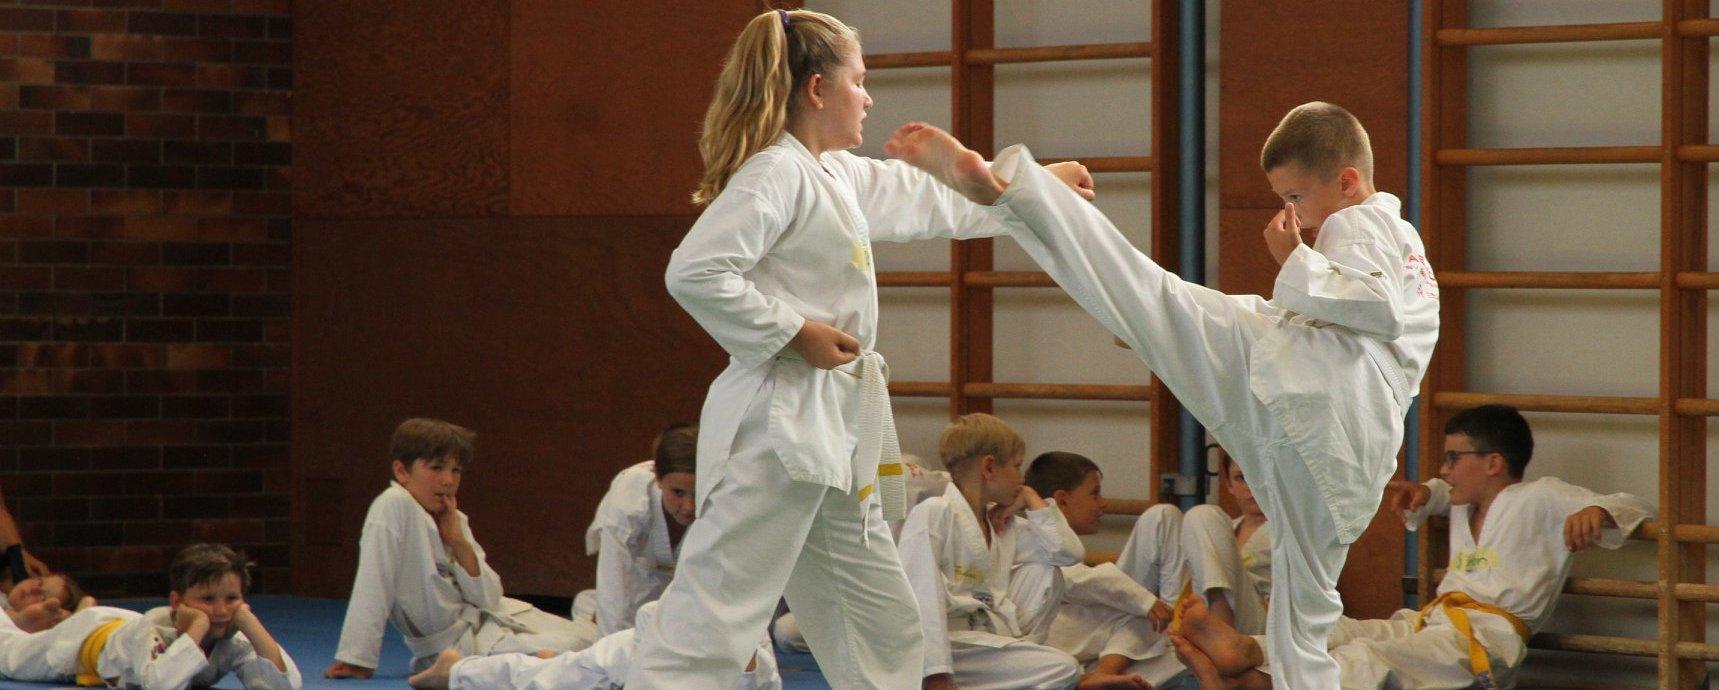 Taekwondo bietet spannendes Ferienprogramm